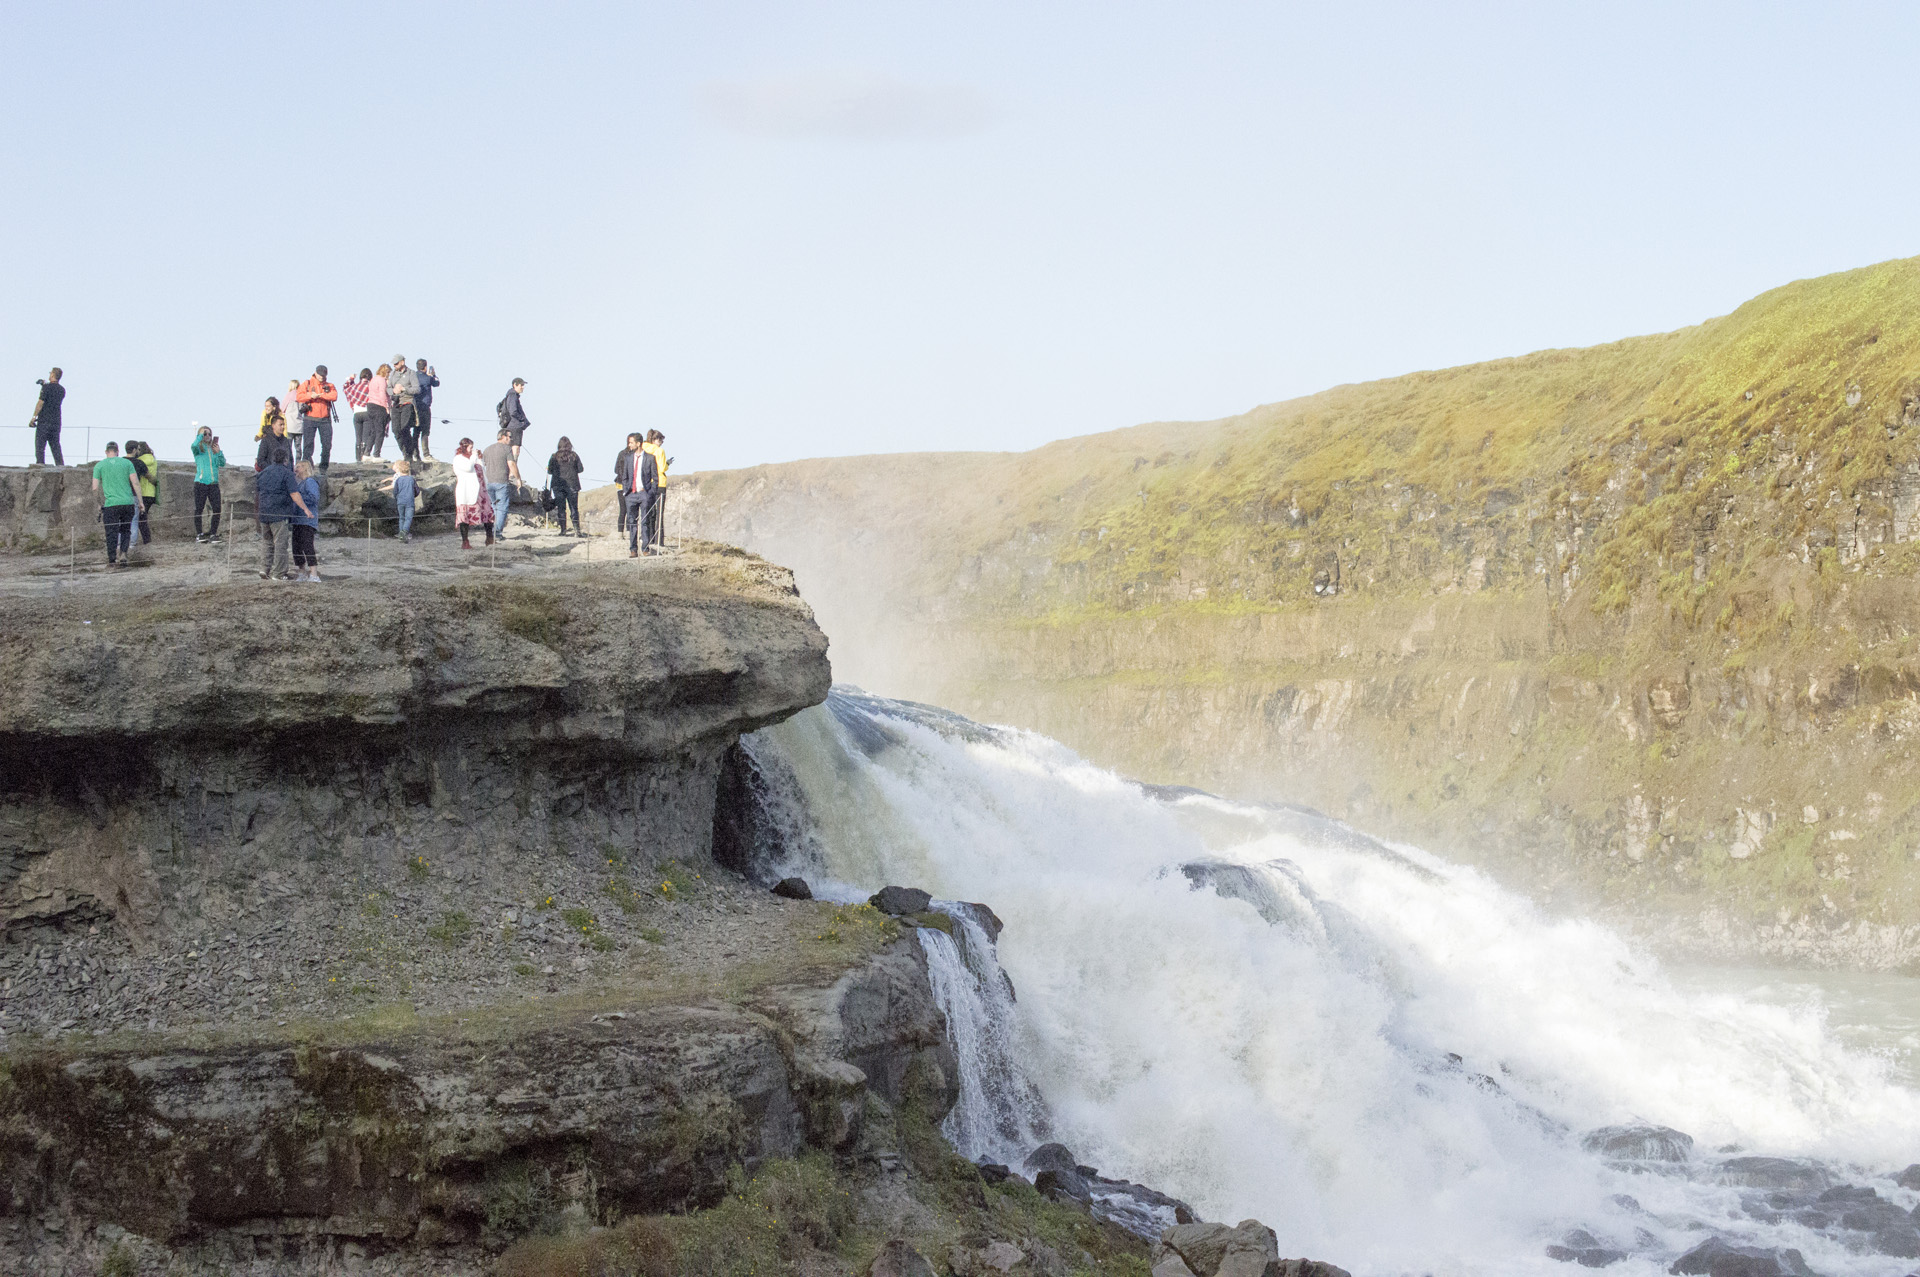 Crowd overlooking Gullfoss waterfall, Suðurland region, Iceland